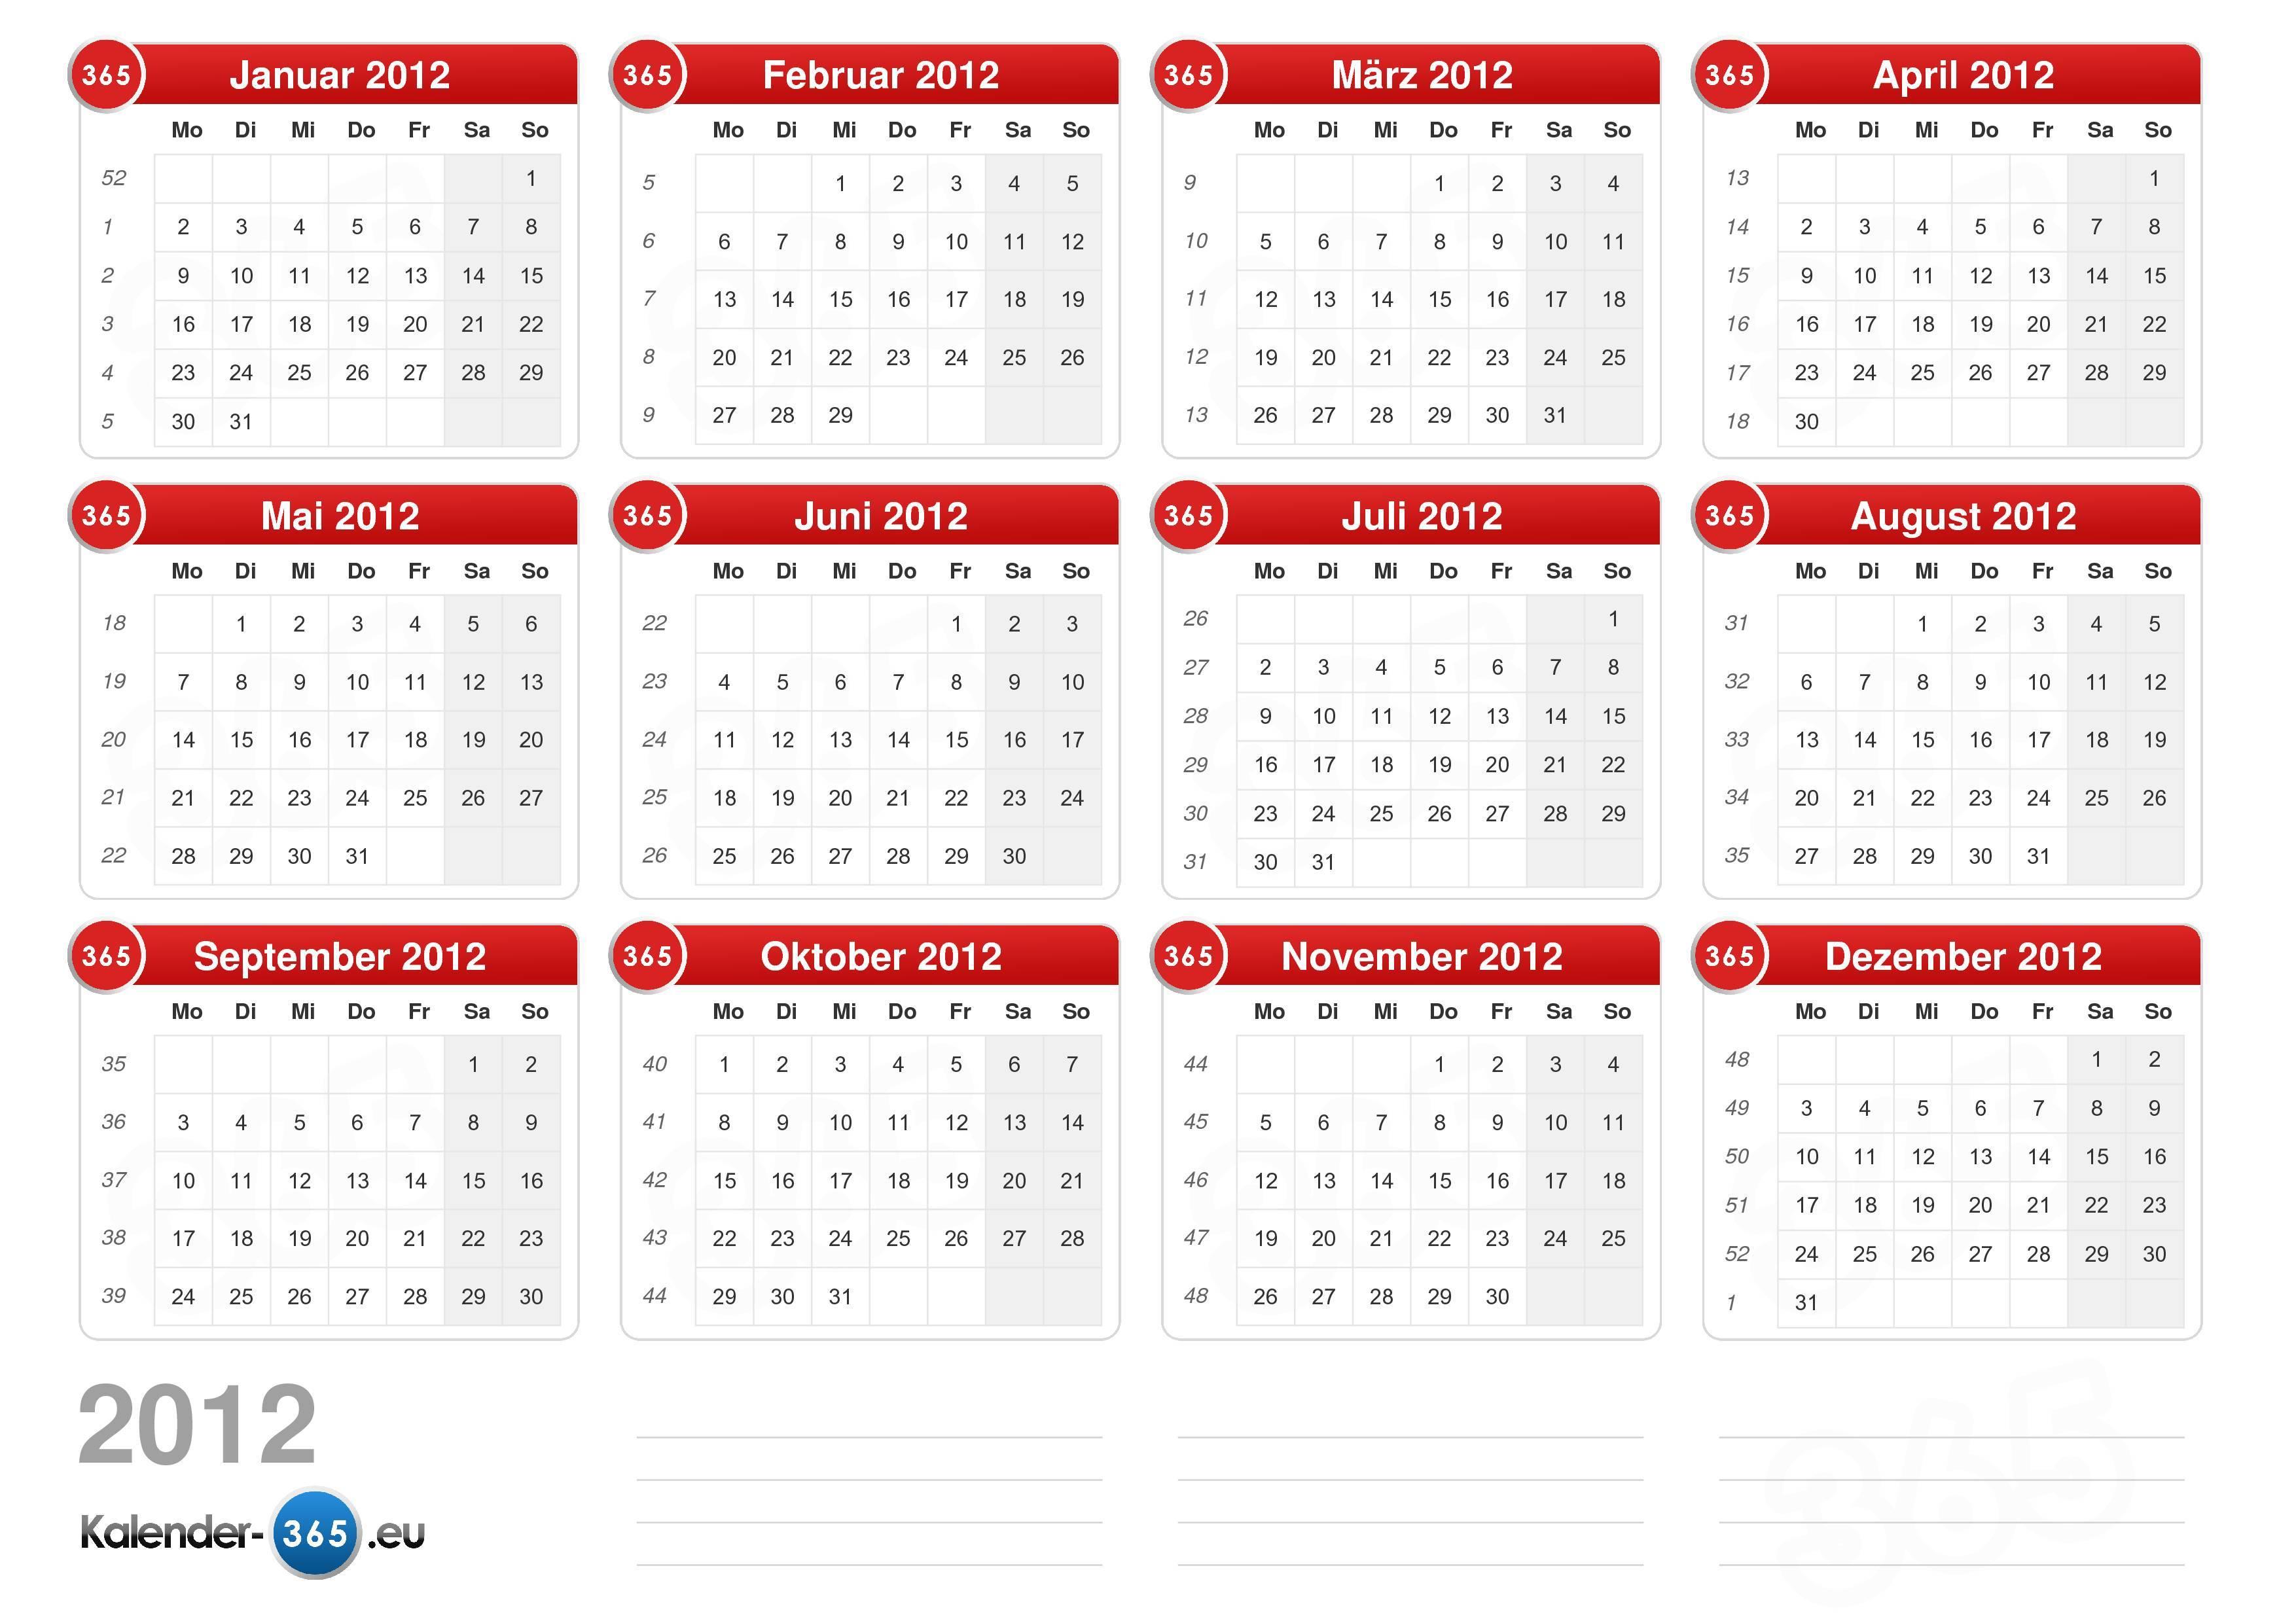 Kalender 2012 (v2)